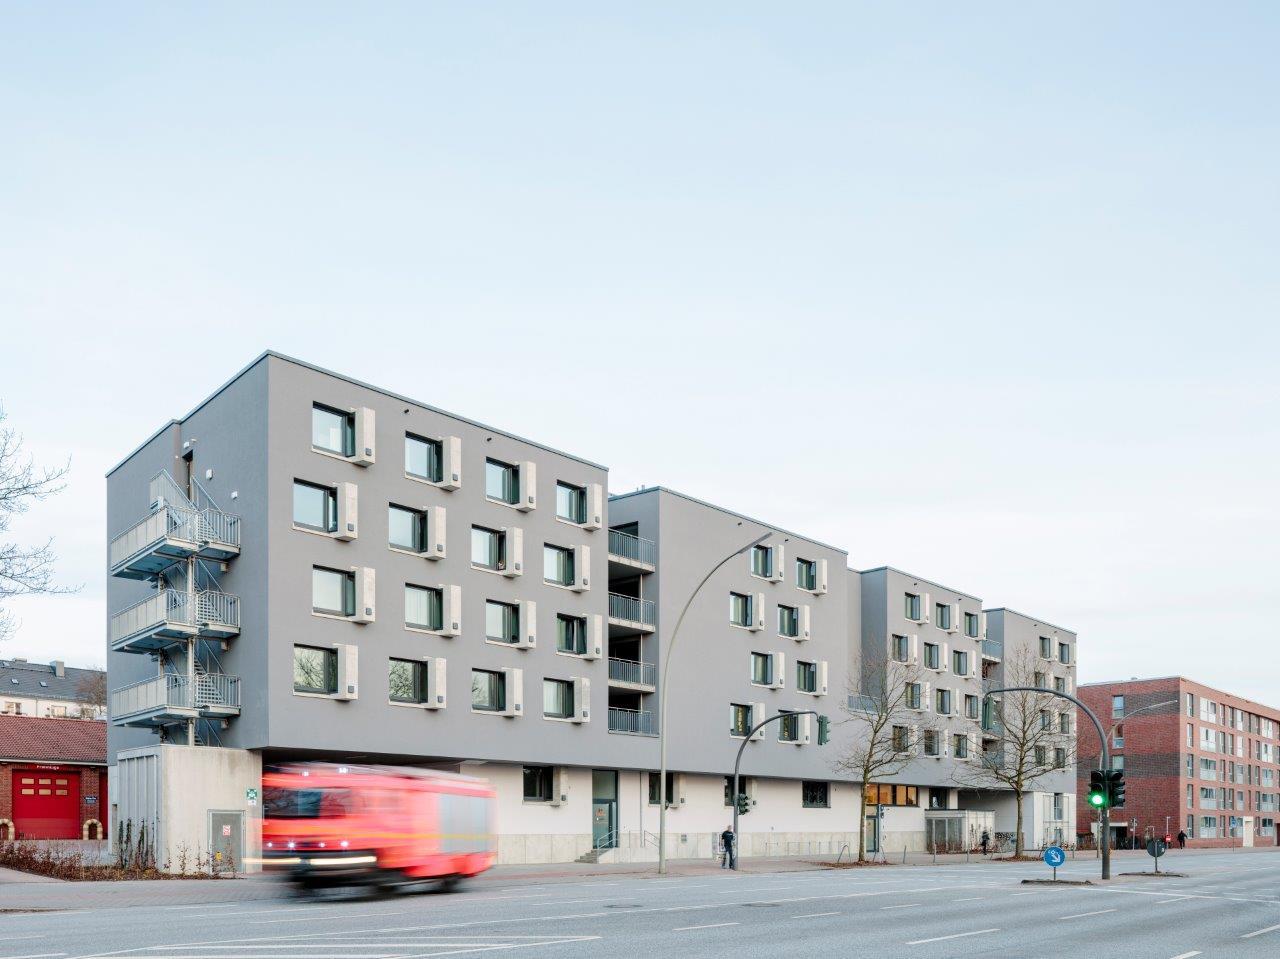 Jugendwohnung Parciusweg, Hamburg